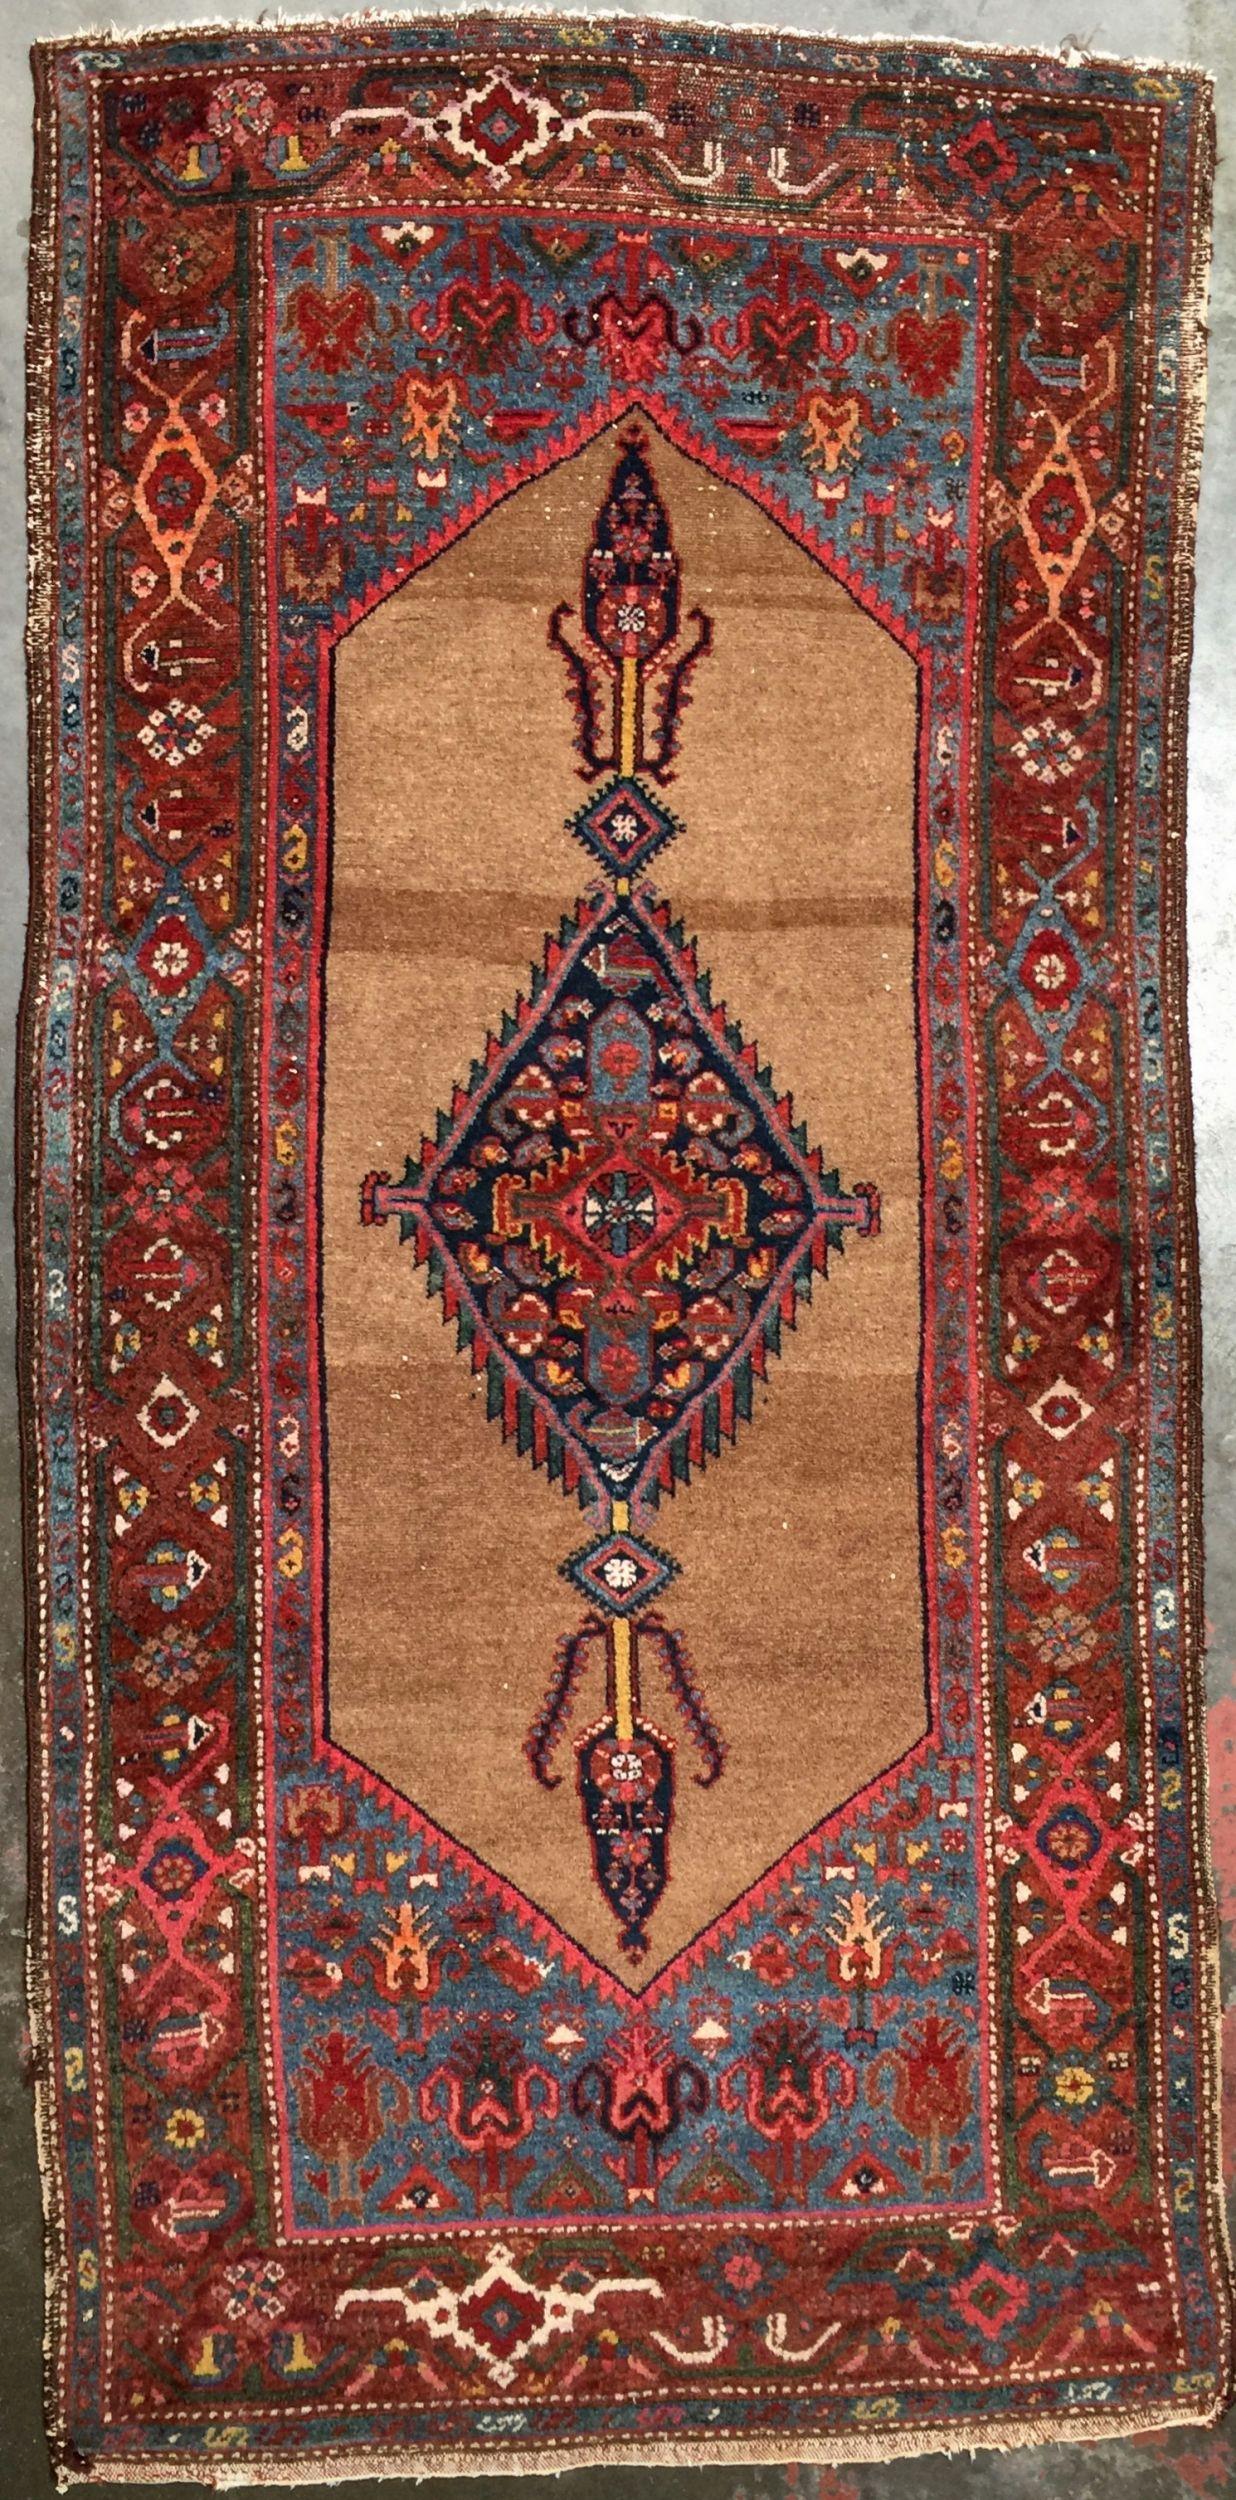 Persian Rug 3 3 X 6 9 Kurdish Tribal Rug Rugs Rugs On Carpet Carpet Runner